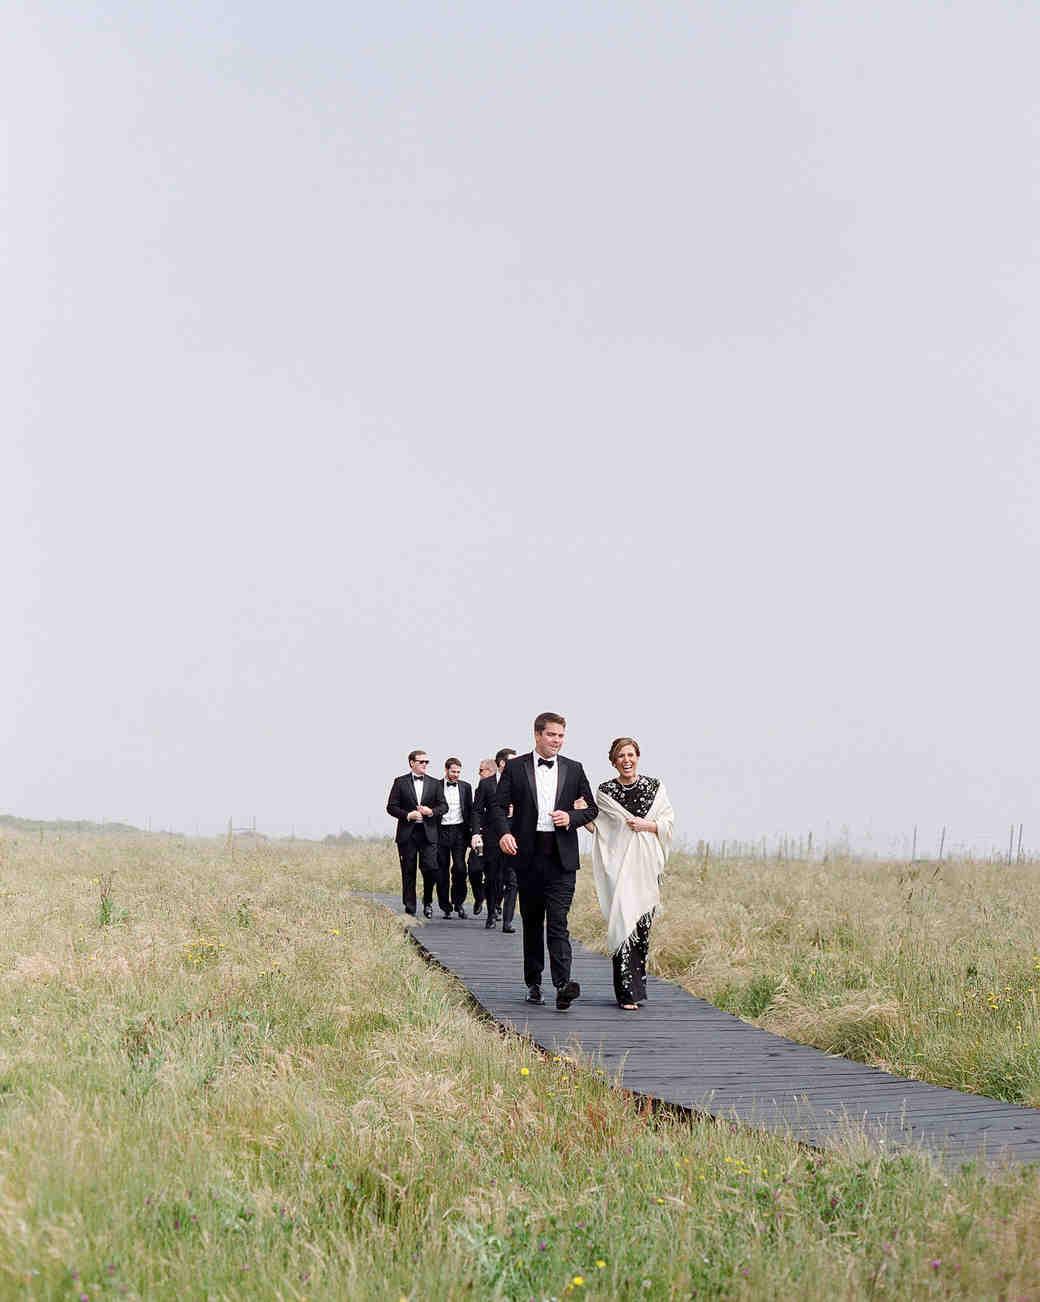 whitney zach wedding guests walking down wooden path in field